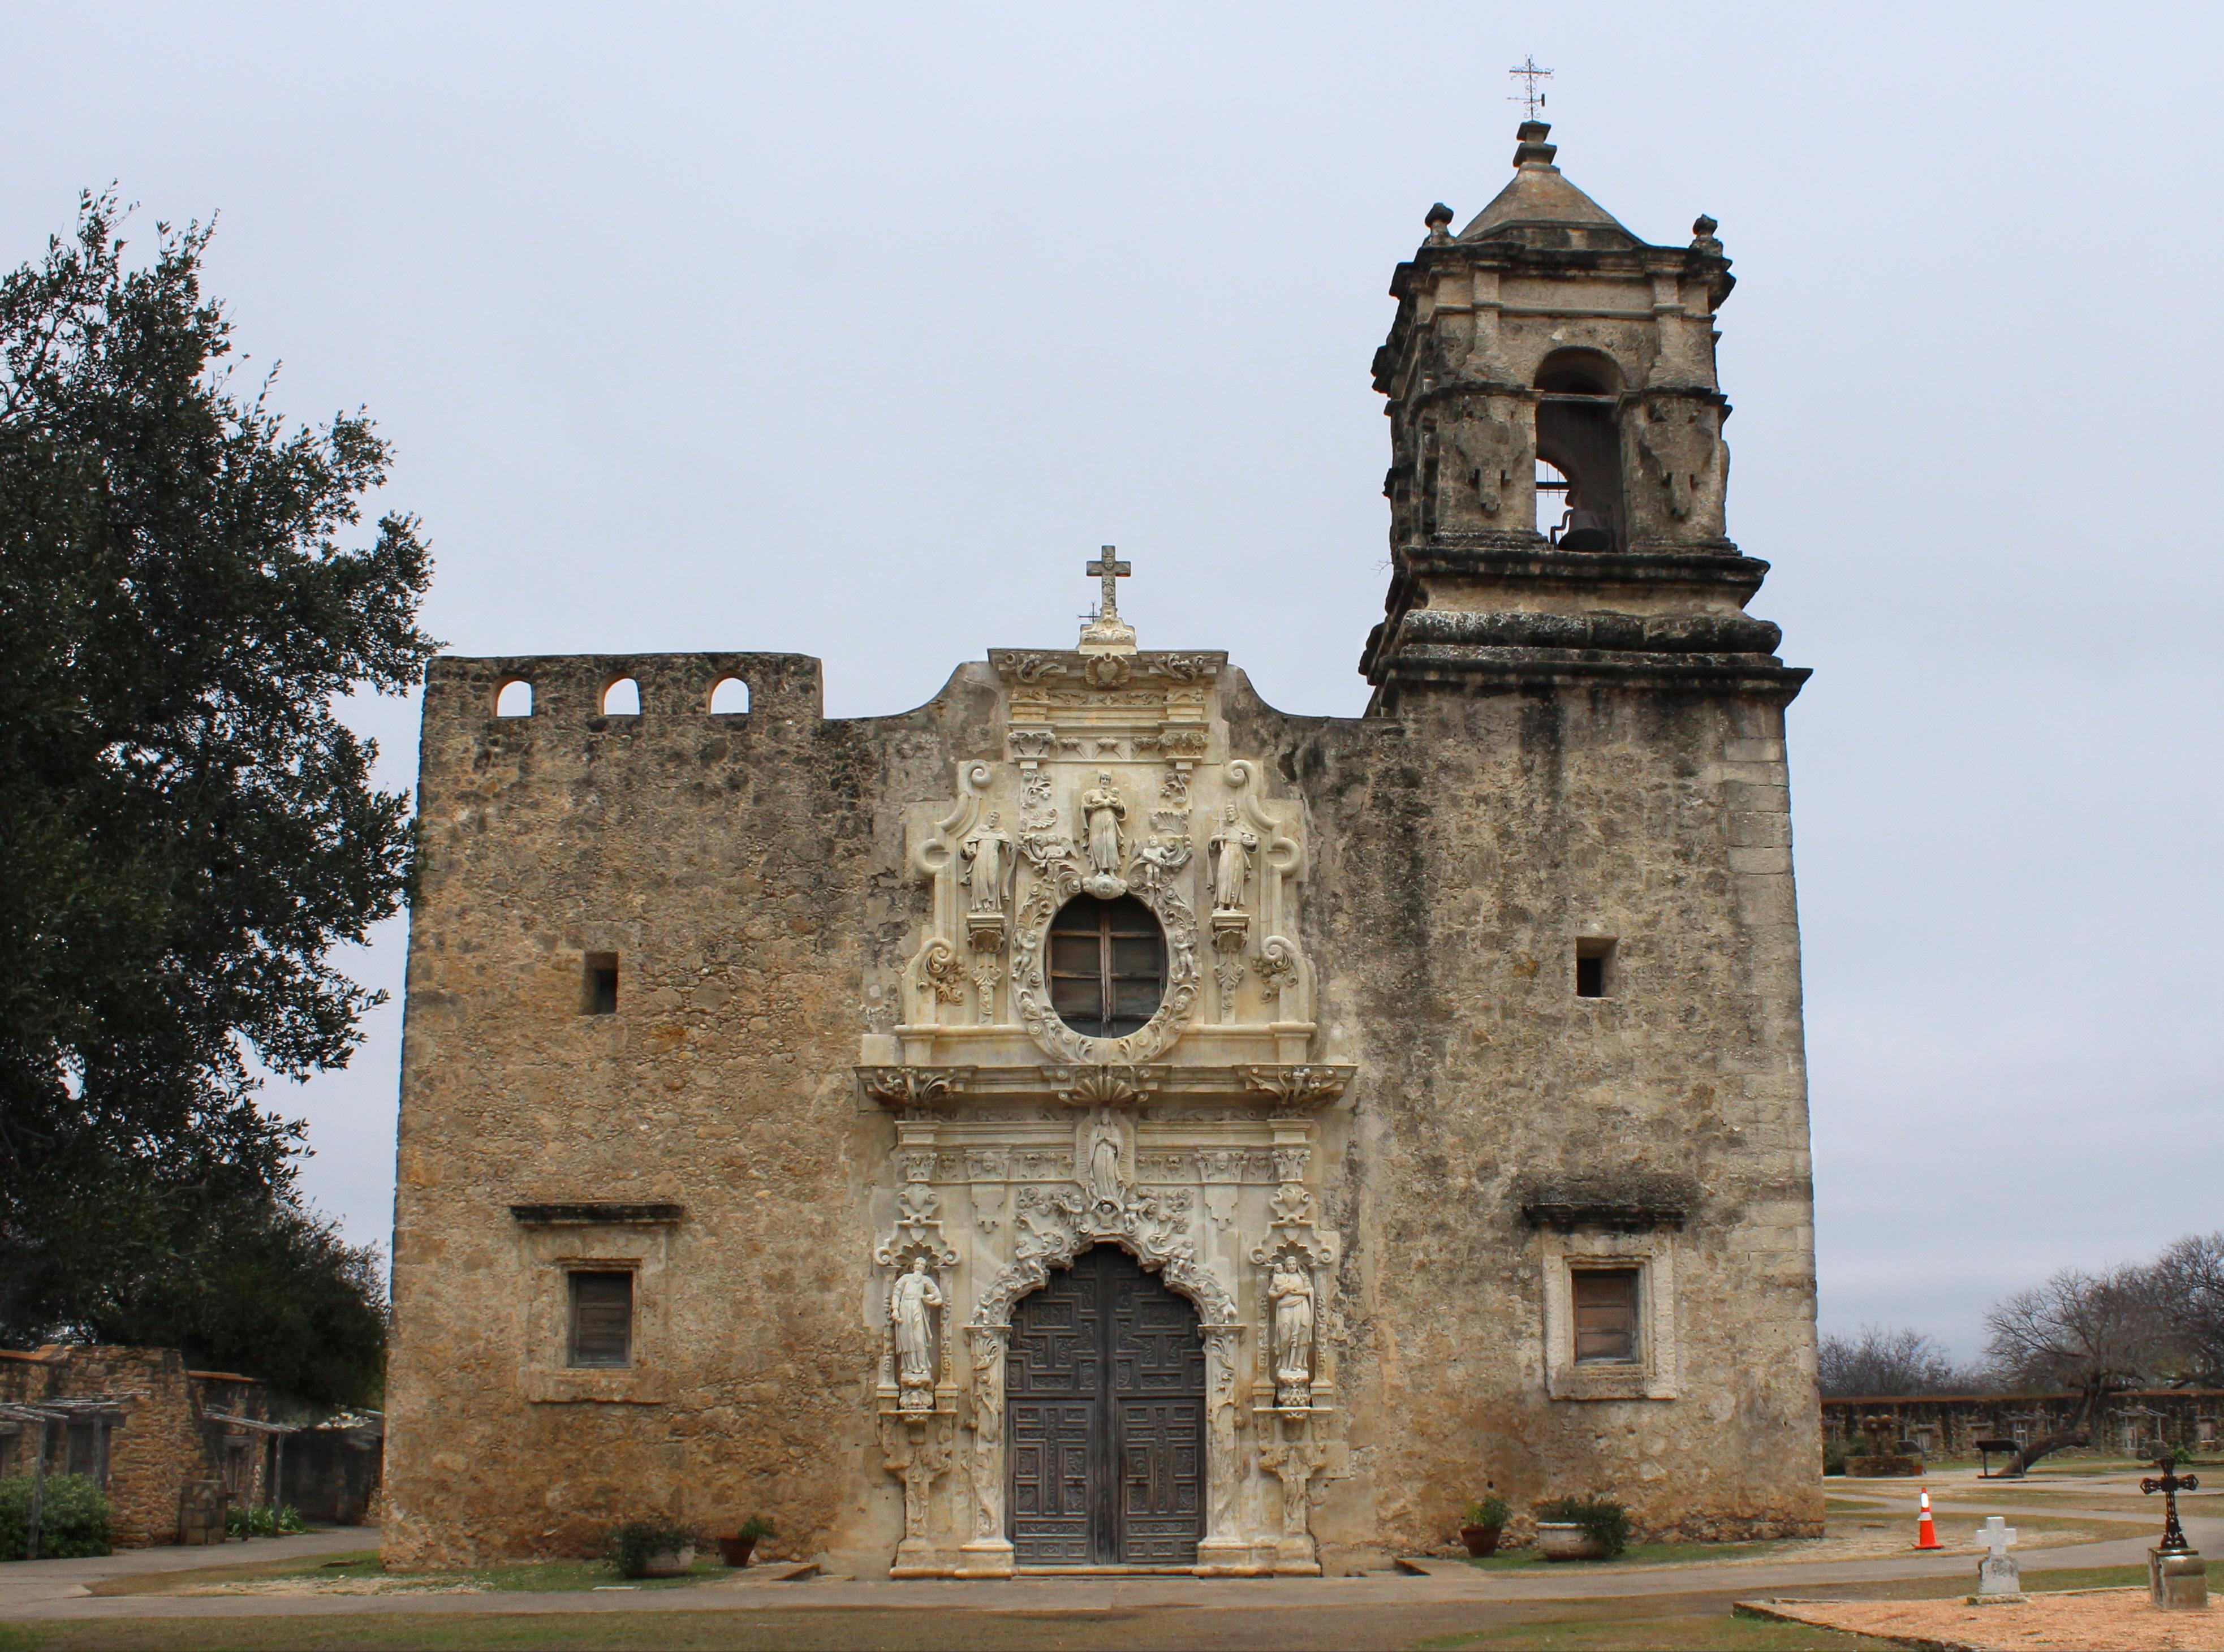 Mission San José y San Miguel de Aguayo - San Antonio, TX - 1782 :  catholicarchitecture